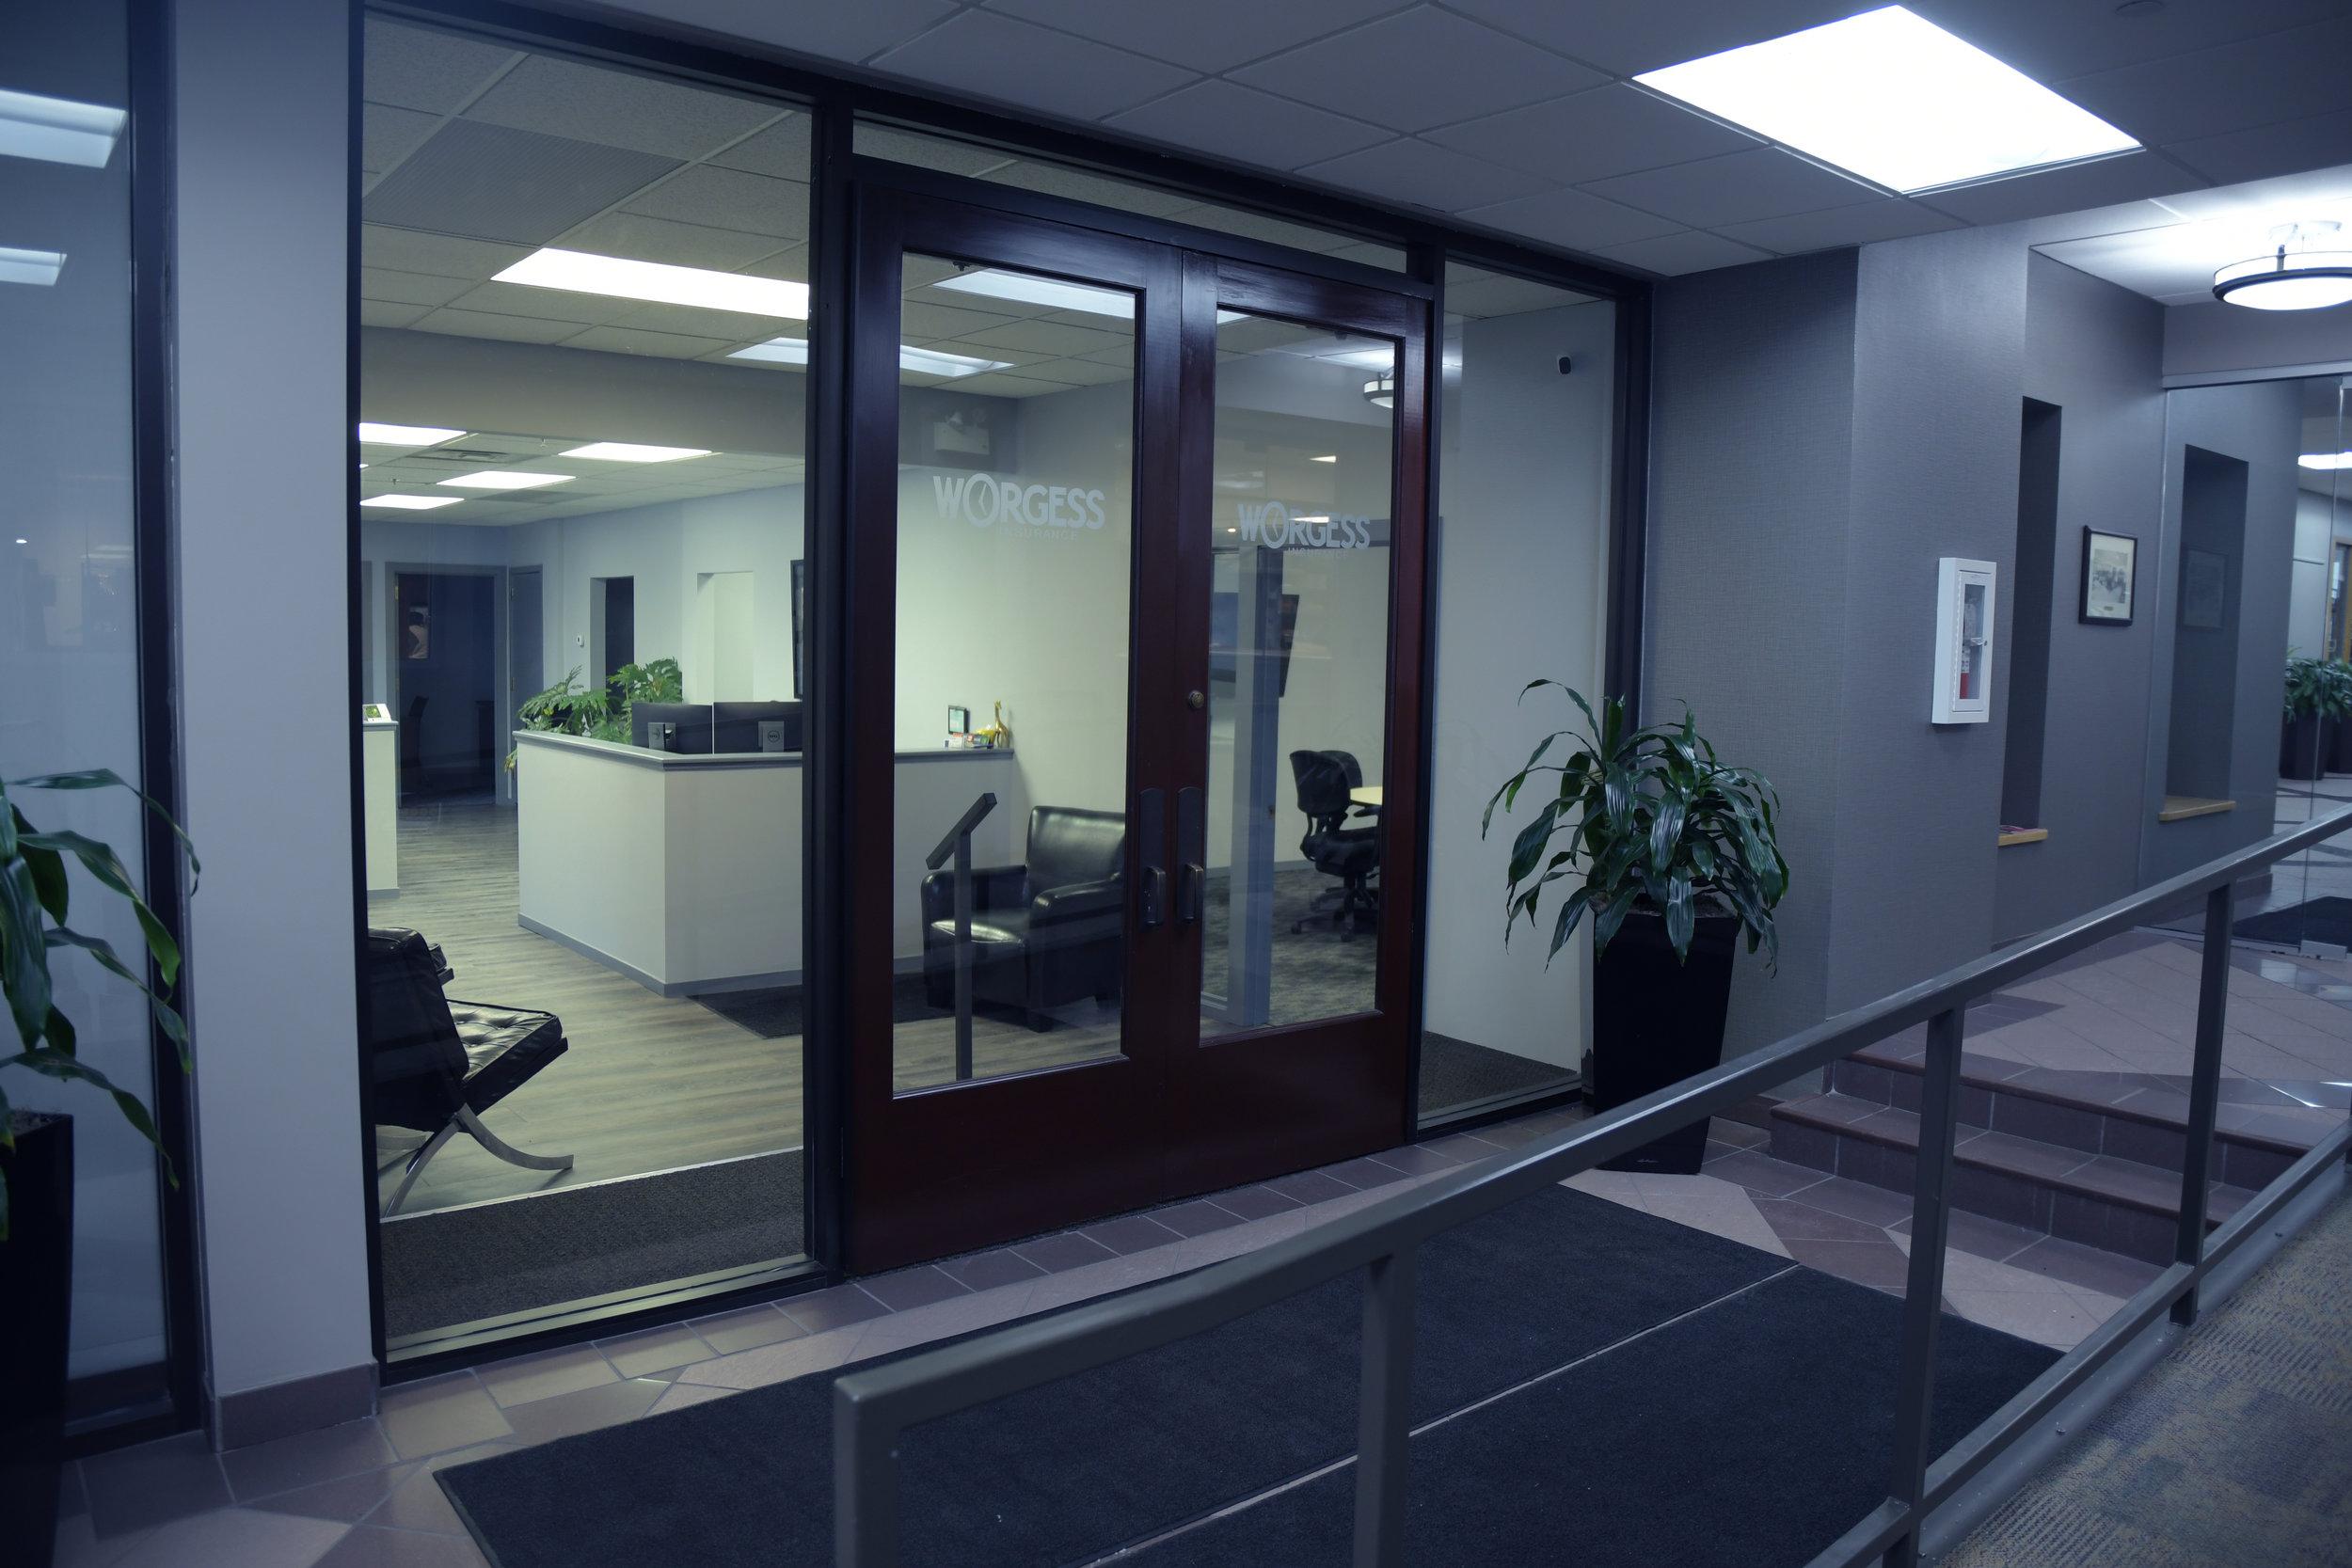 kzoo-office.jpg